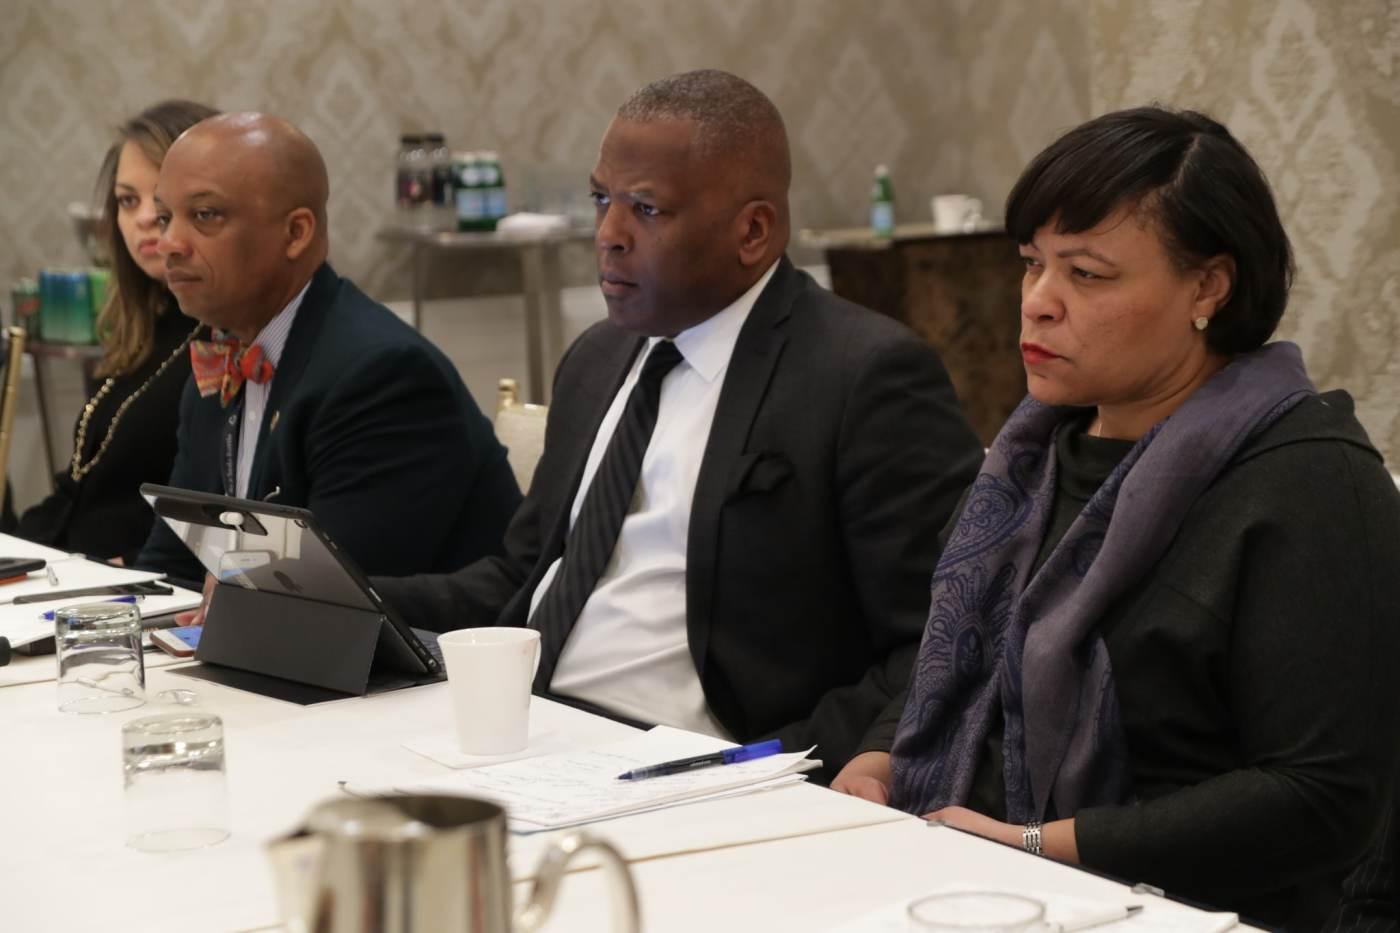 Birmingham, Alabama, Chuck Faush, The YARD, HBCU's, U.S. Conference of Mayors, Washington, D.C.